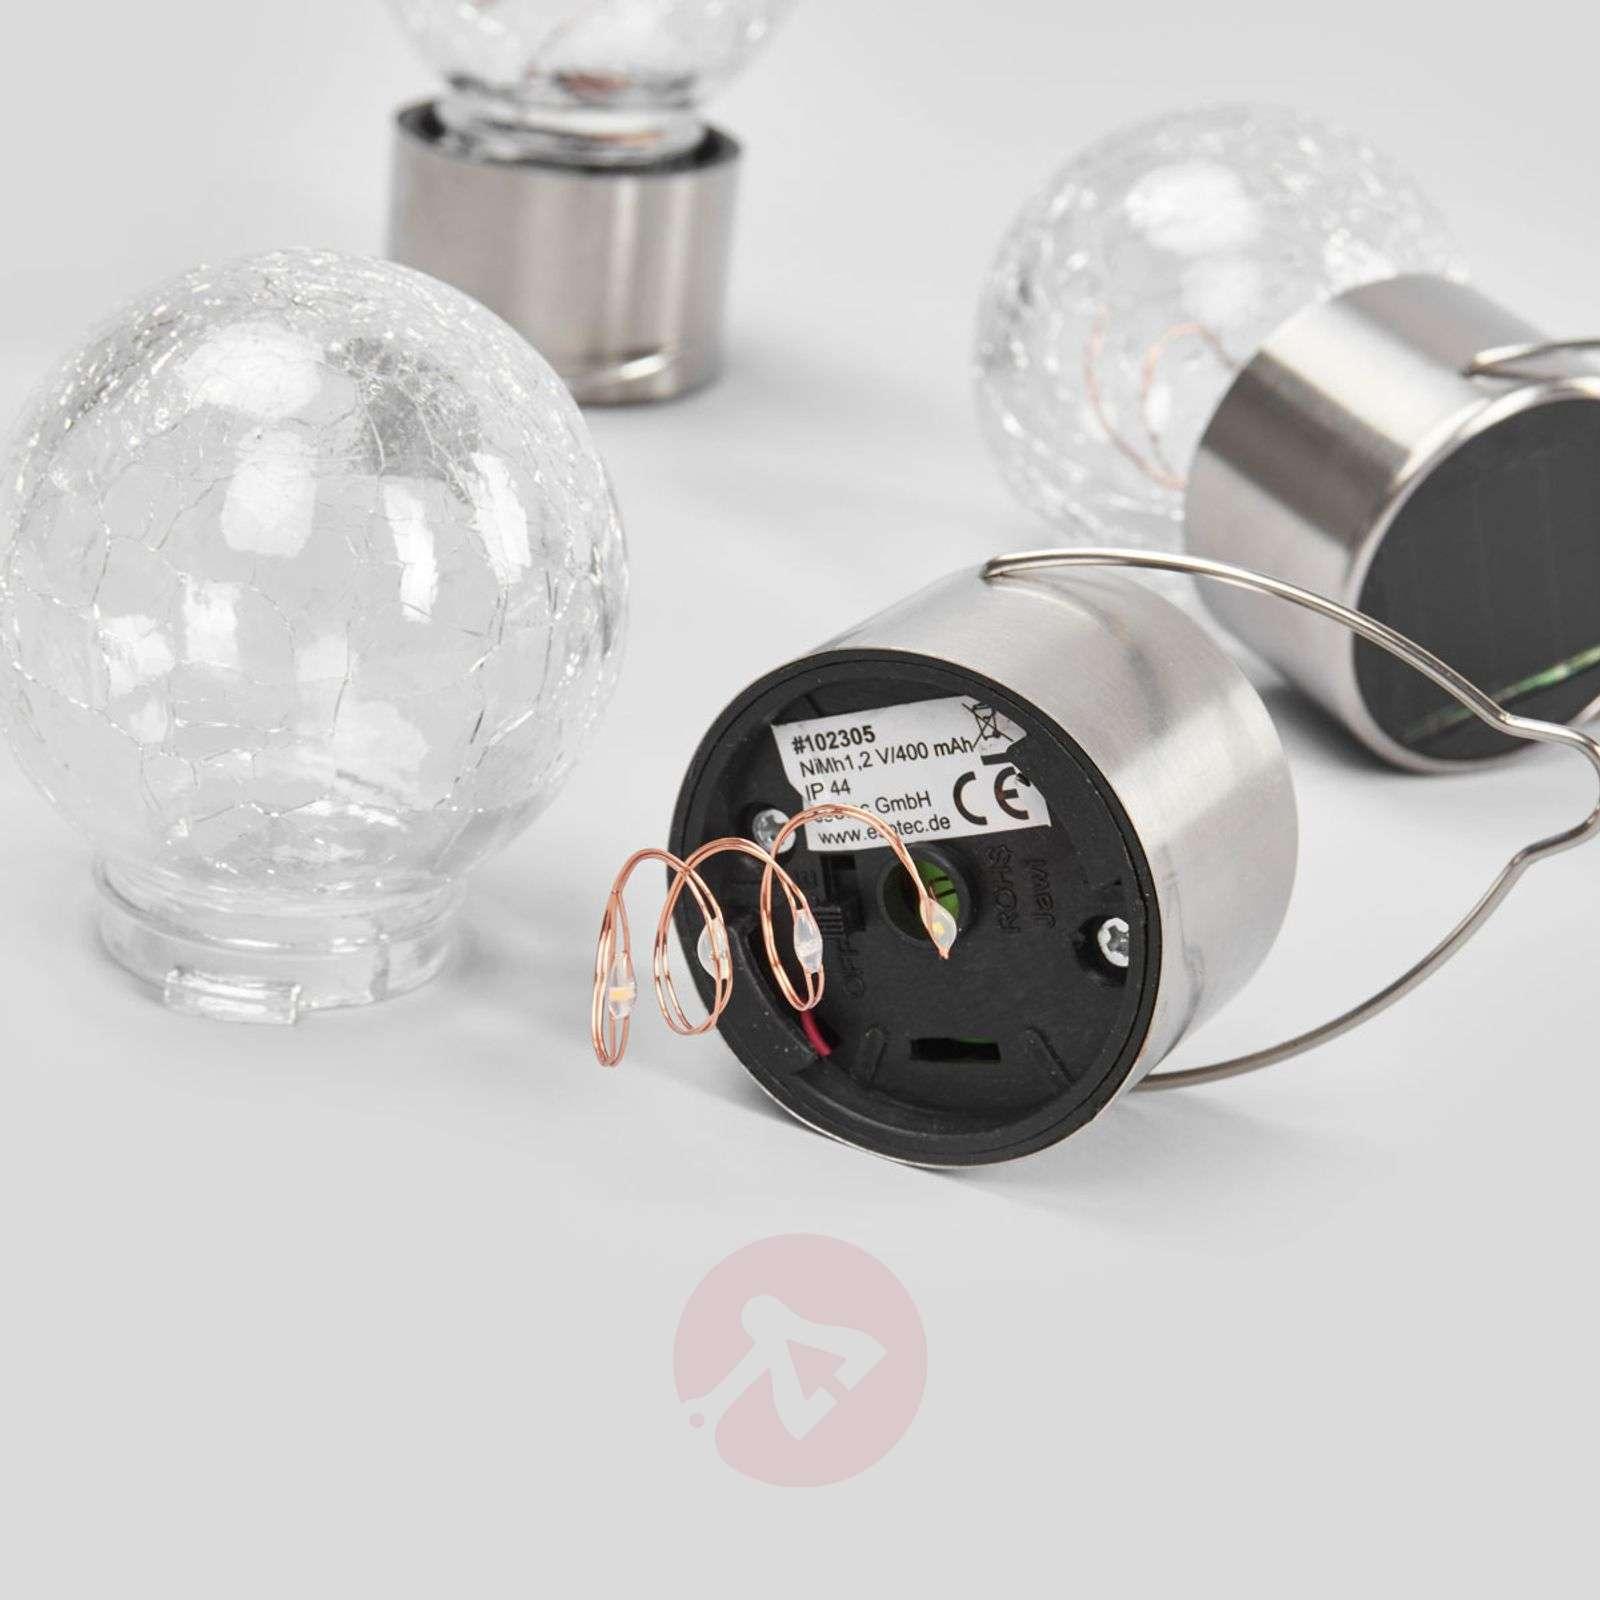 Color Ball-riippuvalot, aurinkokenno/LED 3-os.-3012234-01